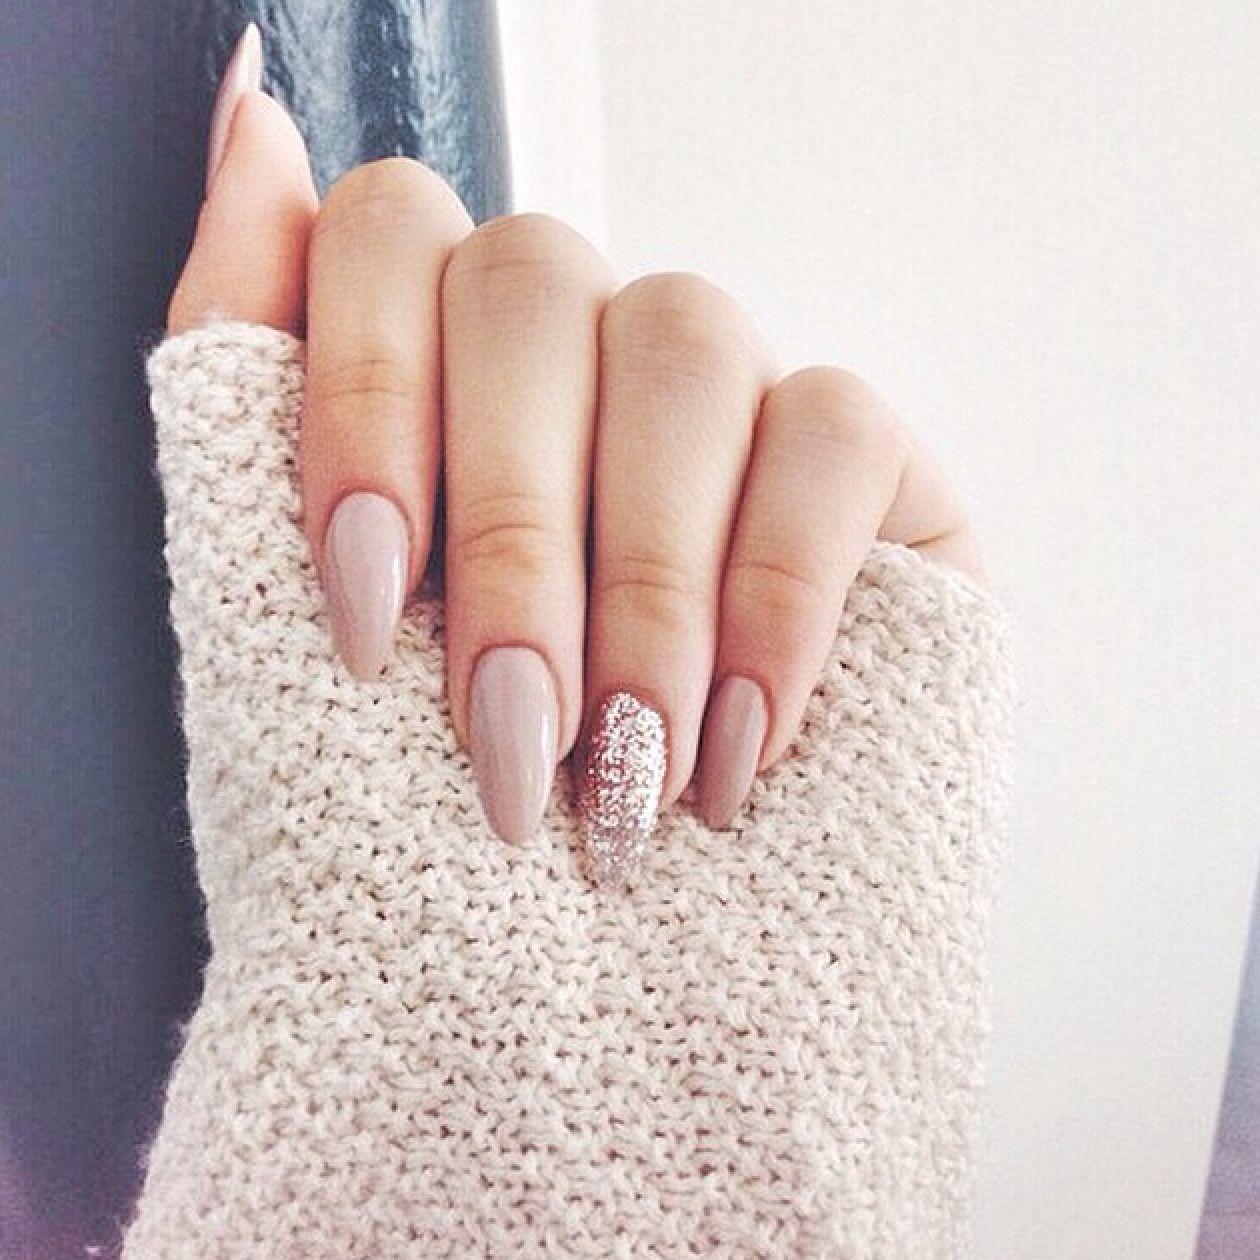 Pinterest: CharlineTM ☼ | Nails | Pinterest | Make up, Manicure and ...